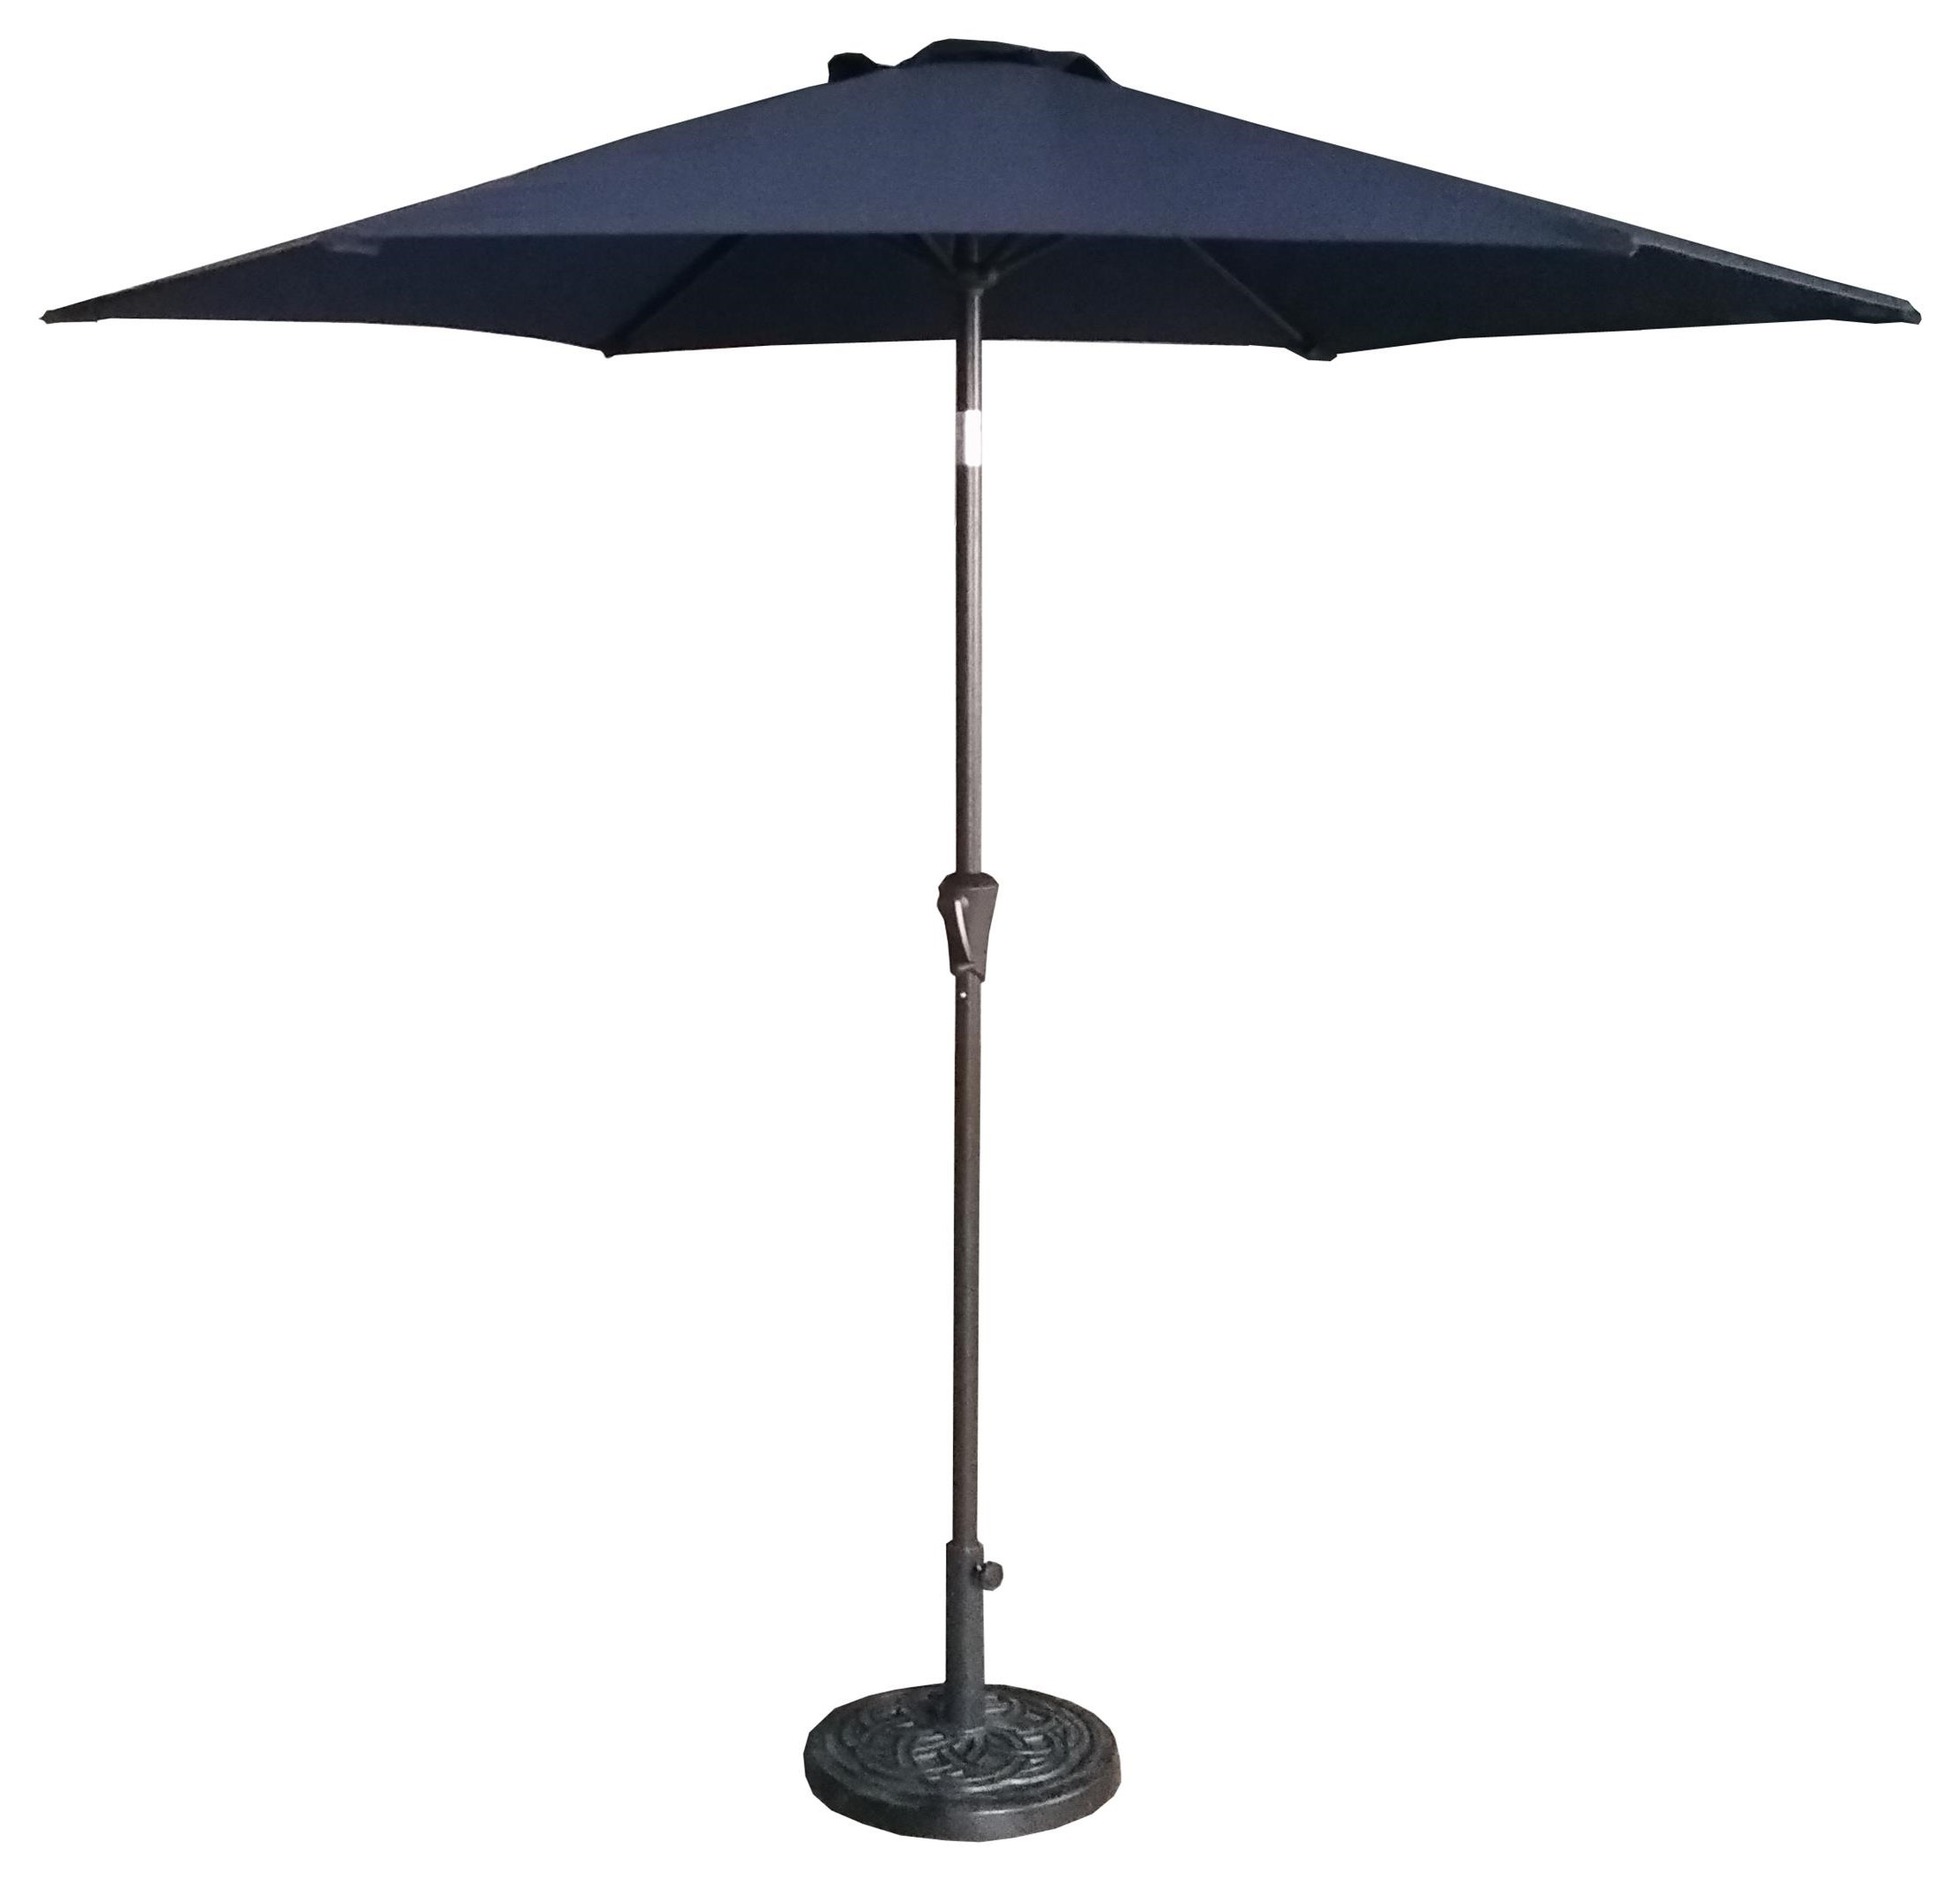 UMBRELLA 9'  Navy Blue Umbrella by GatherCraft at Darvin Furniture